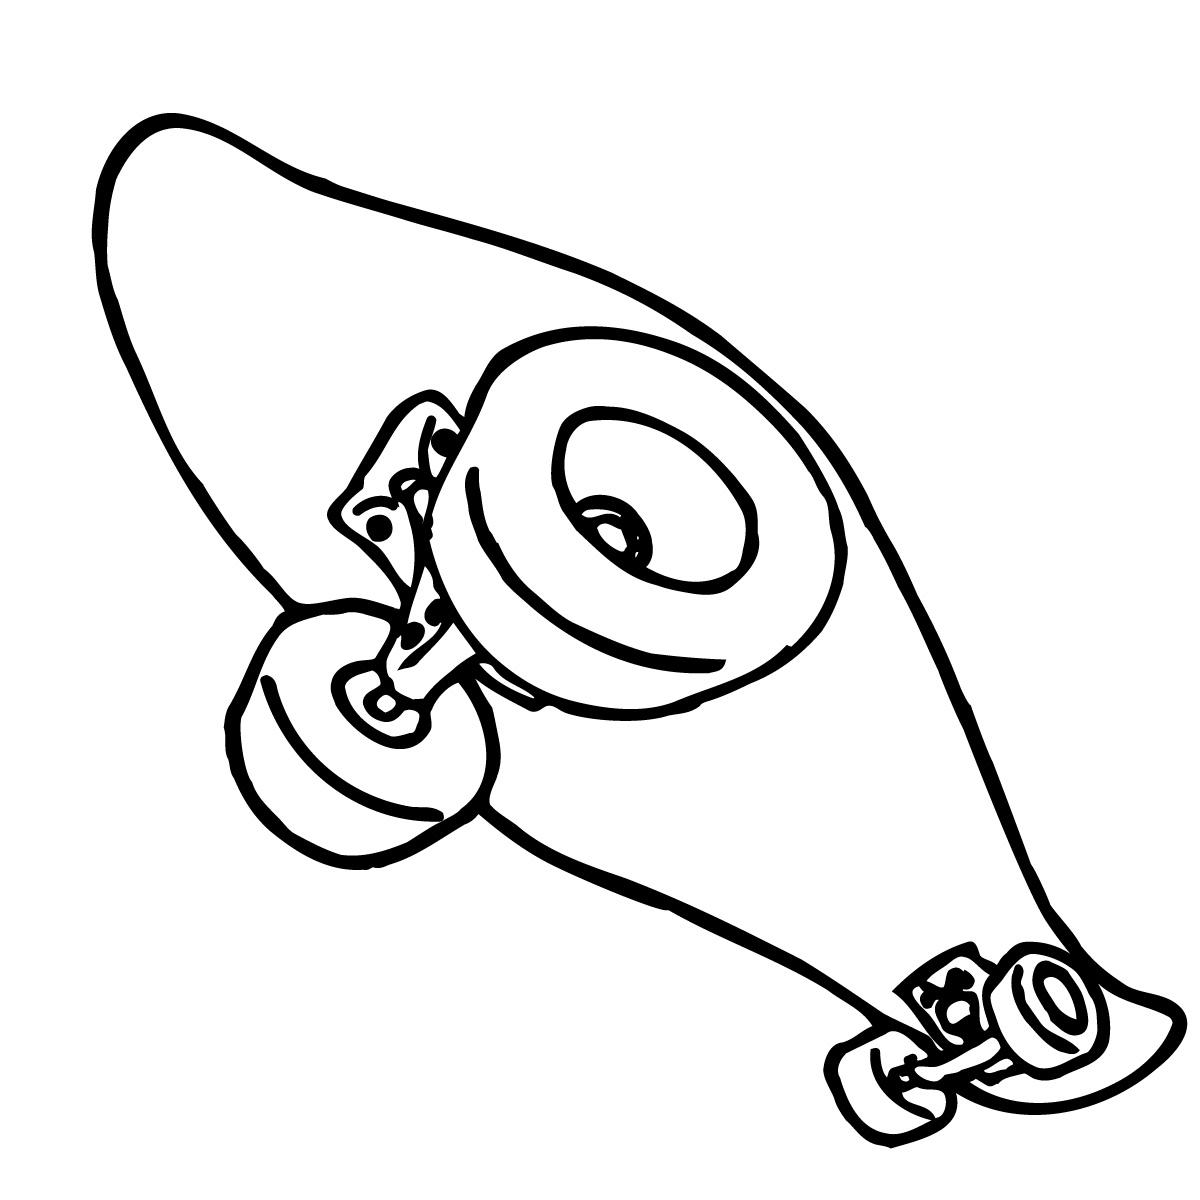 Free Math Borders Download Free Clip Art Free Clip Art